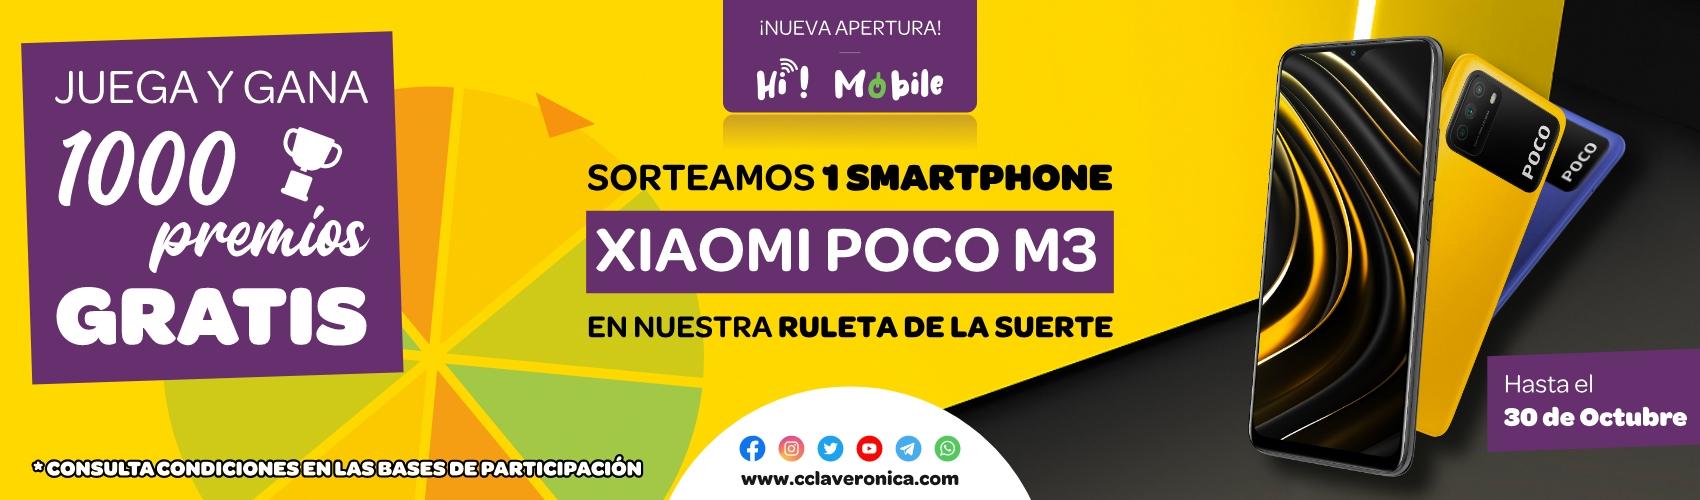 Sorteo Ruleta Hi Mobile - Centro Comercial la Verónica